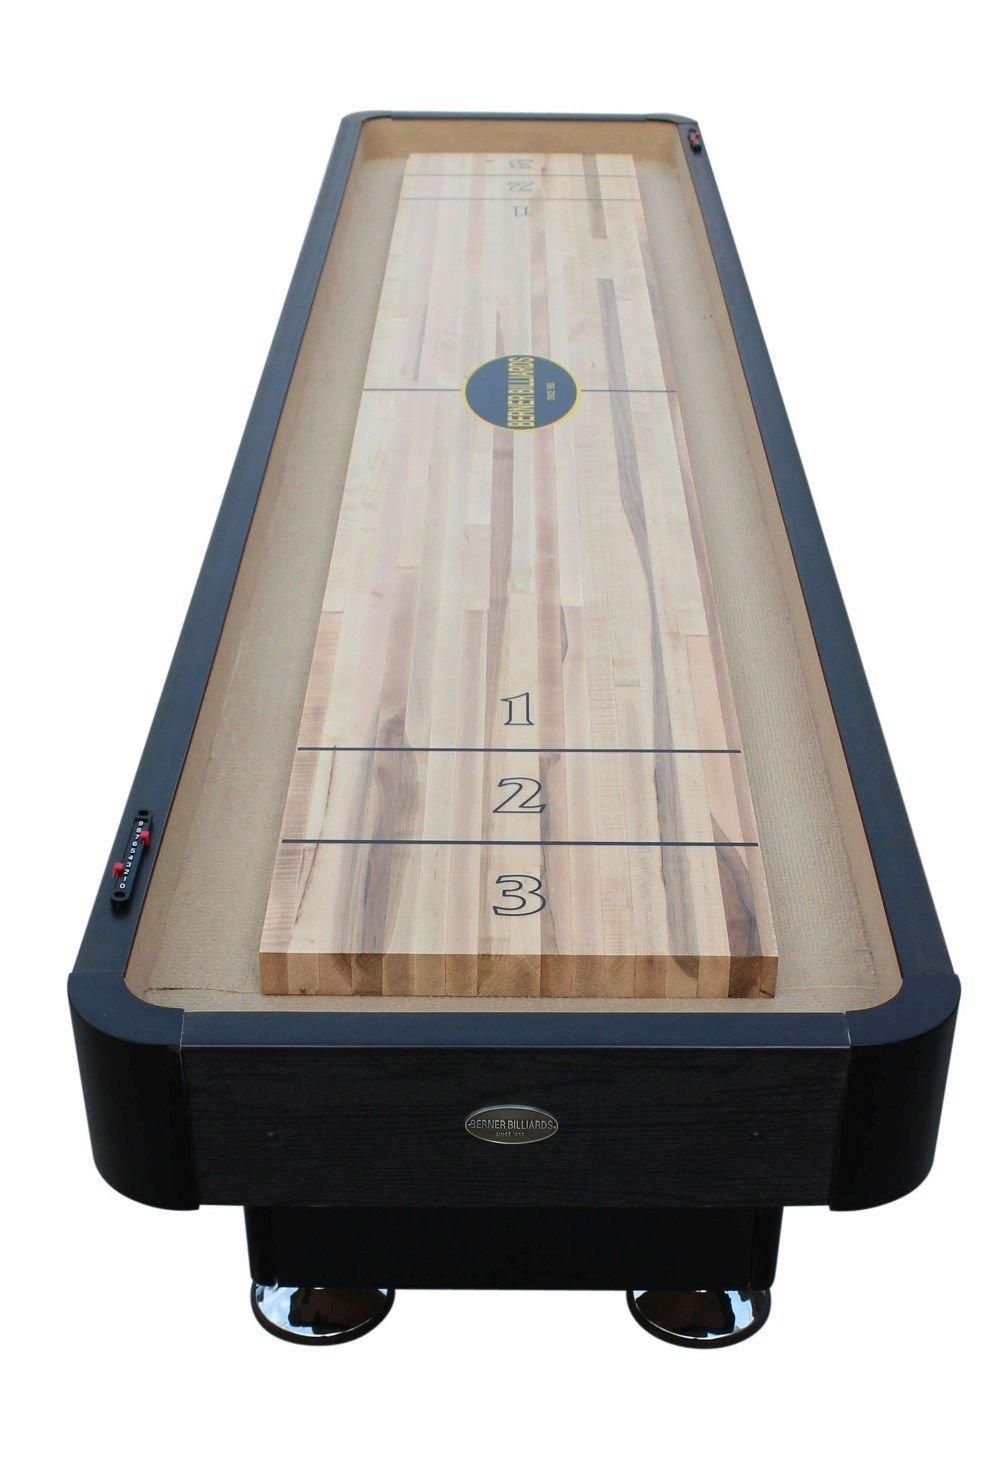 Berner Billiards The Standard 12 Foot Shuffleboard Table in Black by Berner Billiards